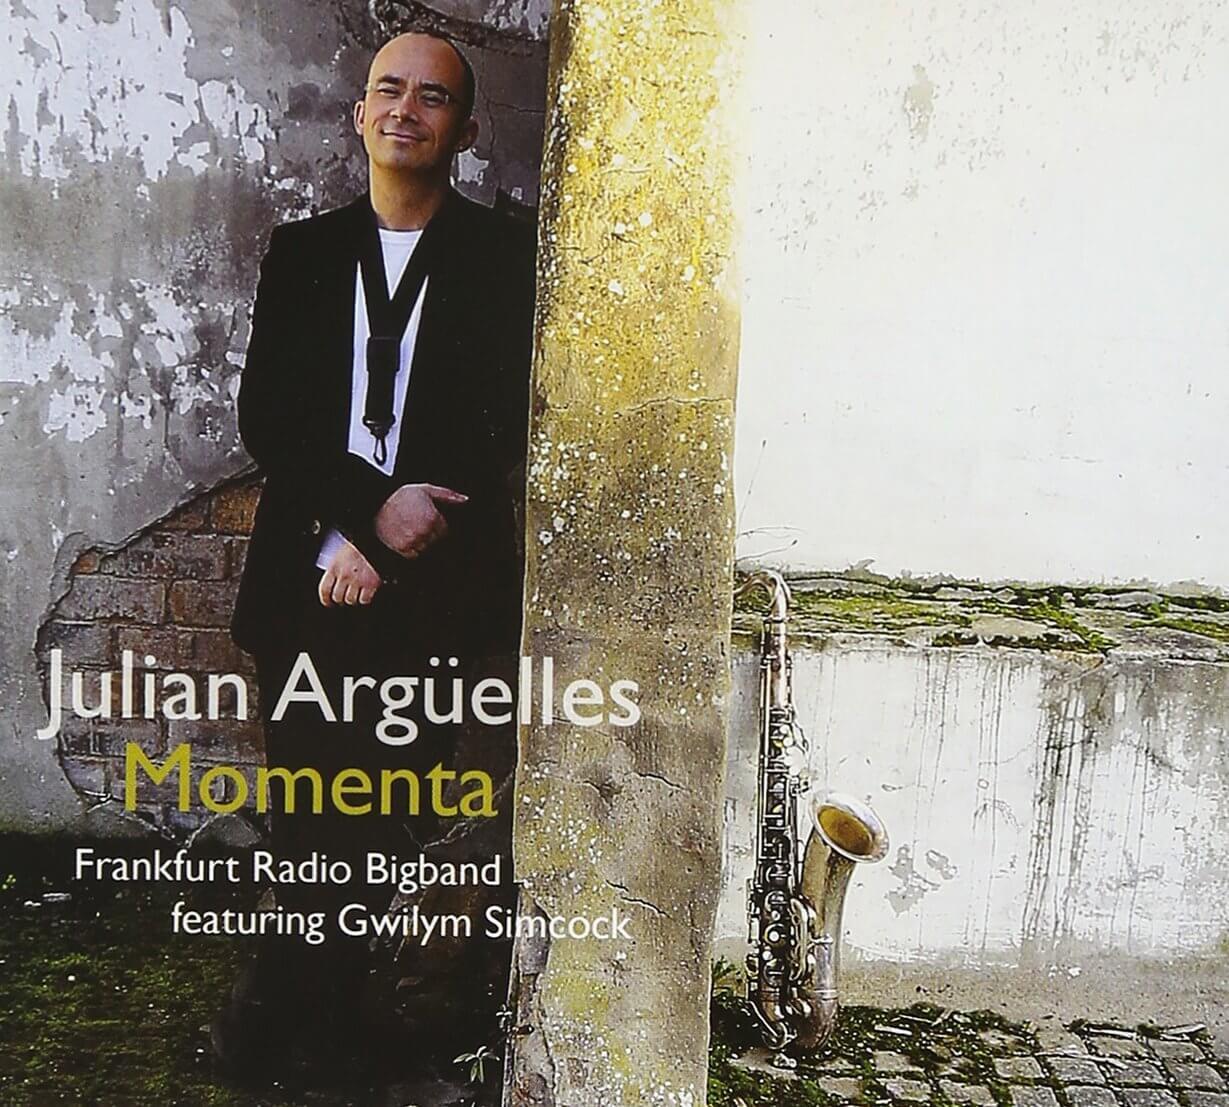 Julian Arguelles - Momenta